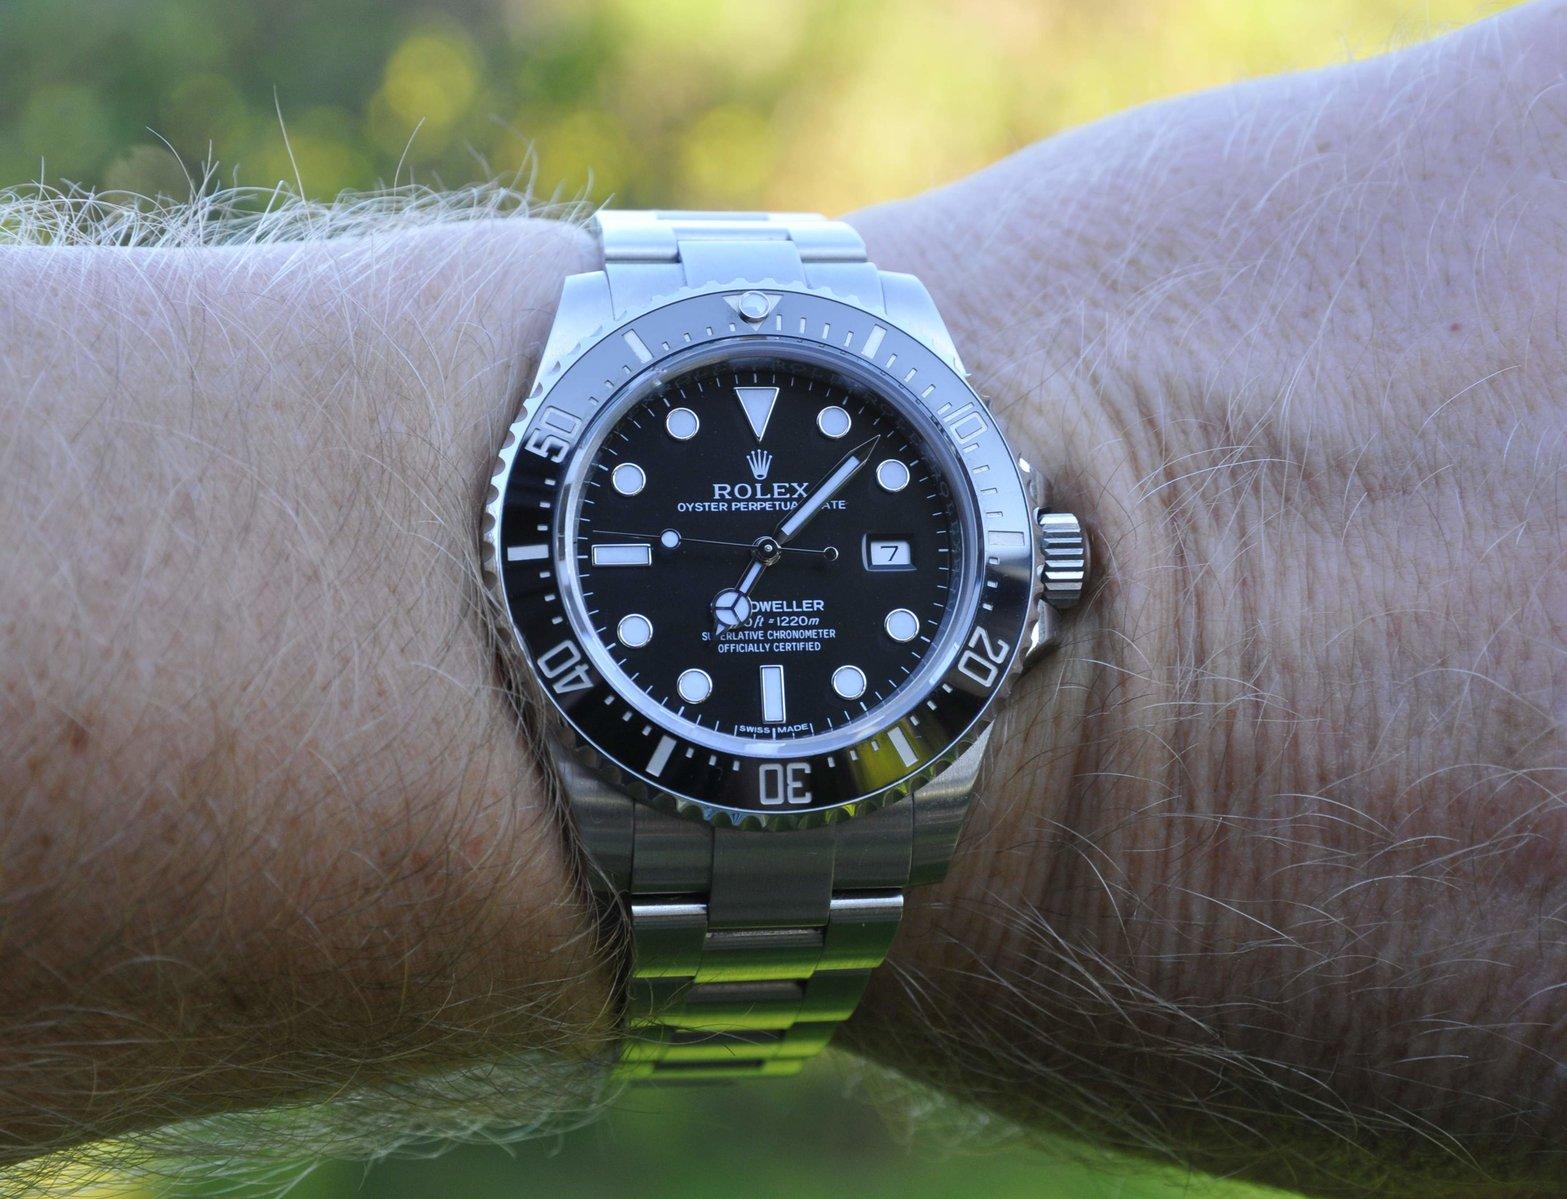 Rolex 2015-08-07.jpg